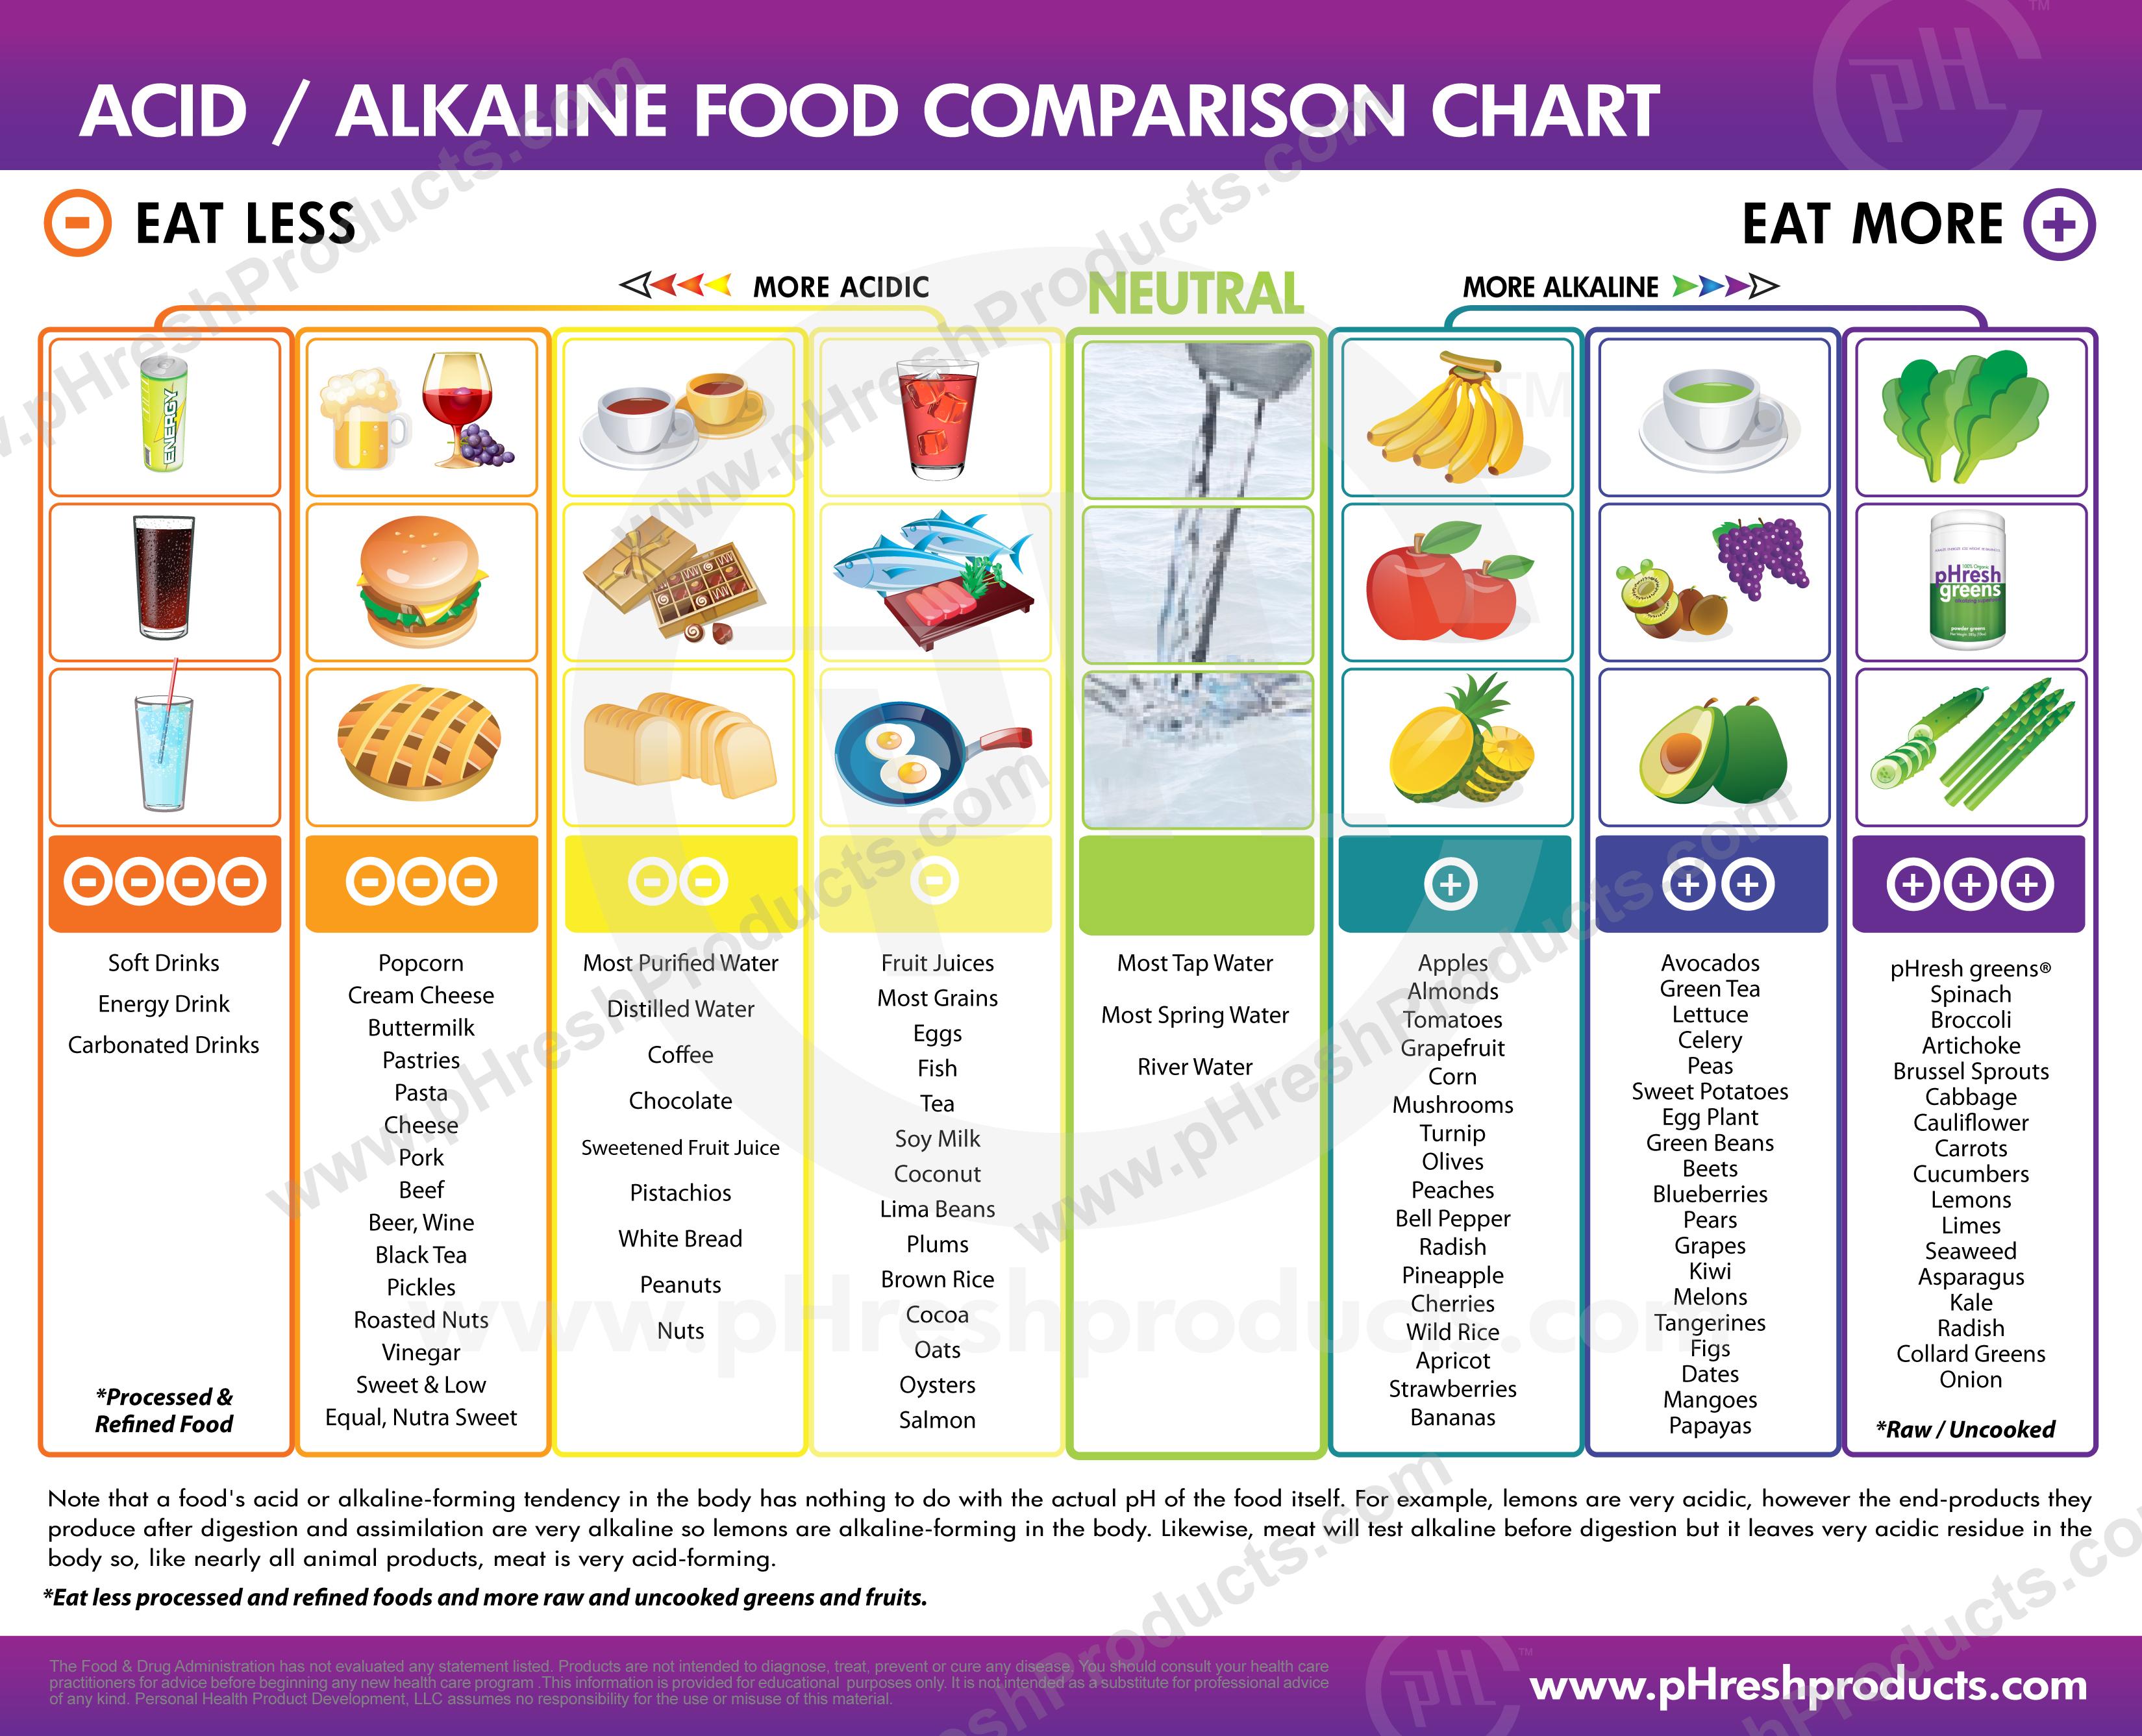 alkaline foods ph chart for urine: Basic acidic foods food